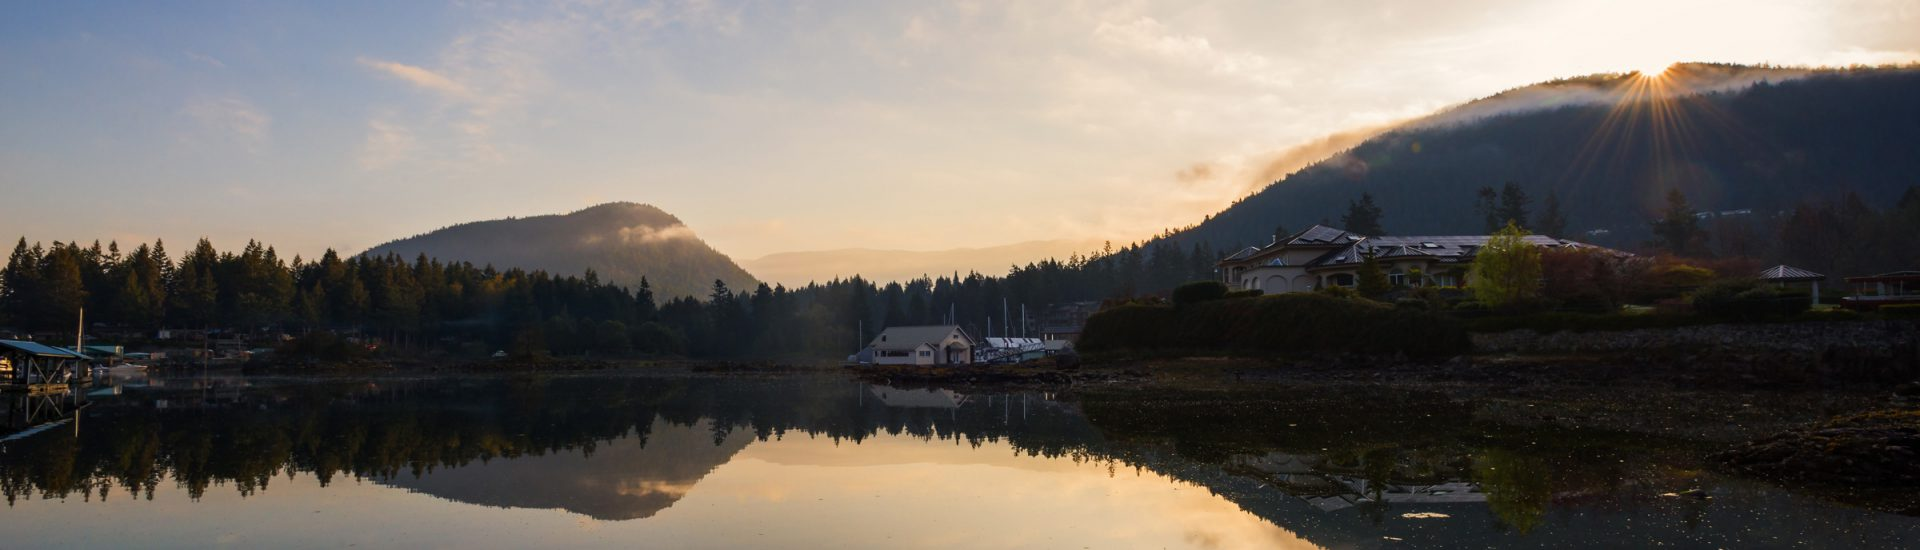 pender-harbour-sunrise